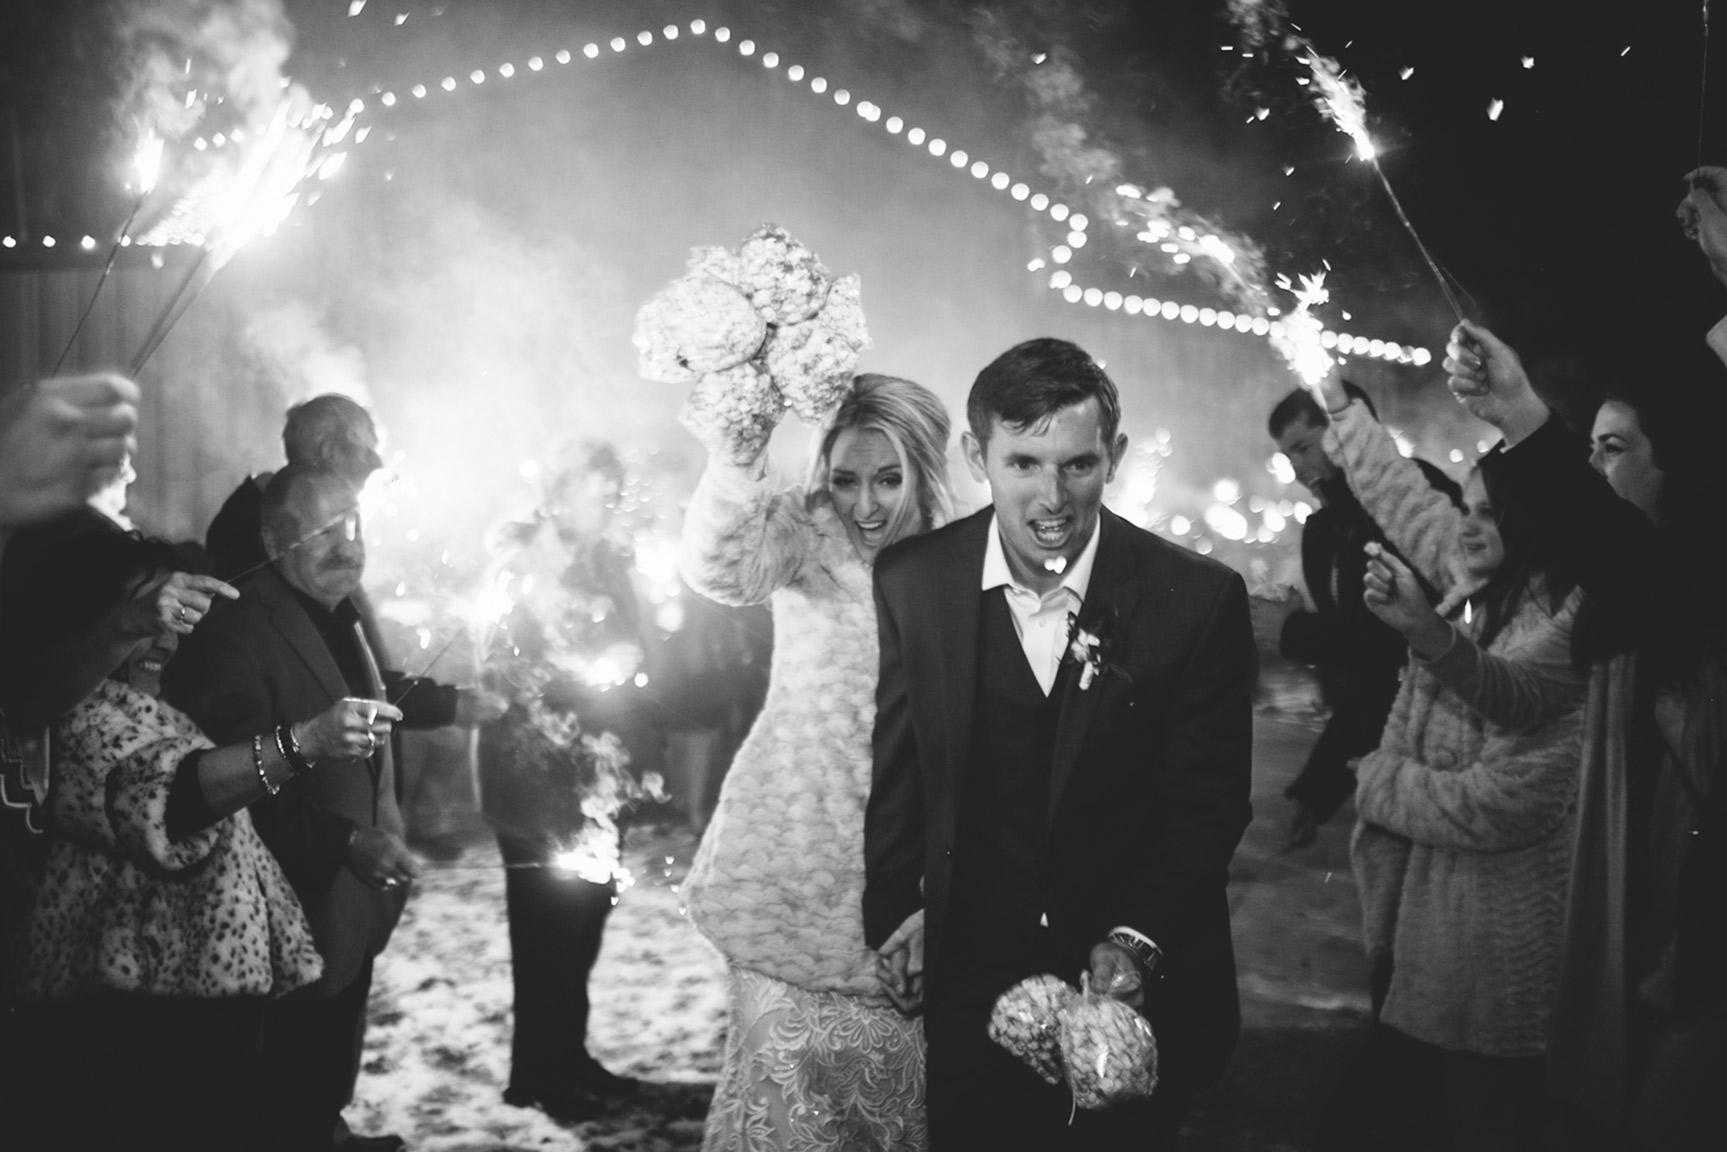 Cotton_Creek_Barn_Winter_Wedding_WeddingPhotographer063.jpg